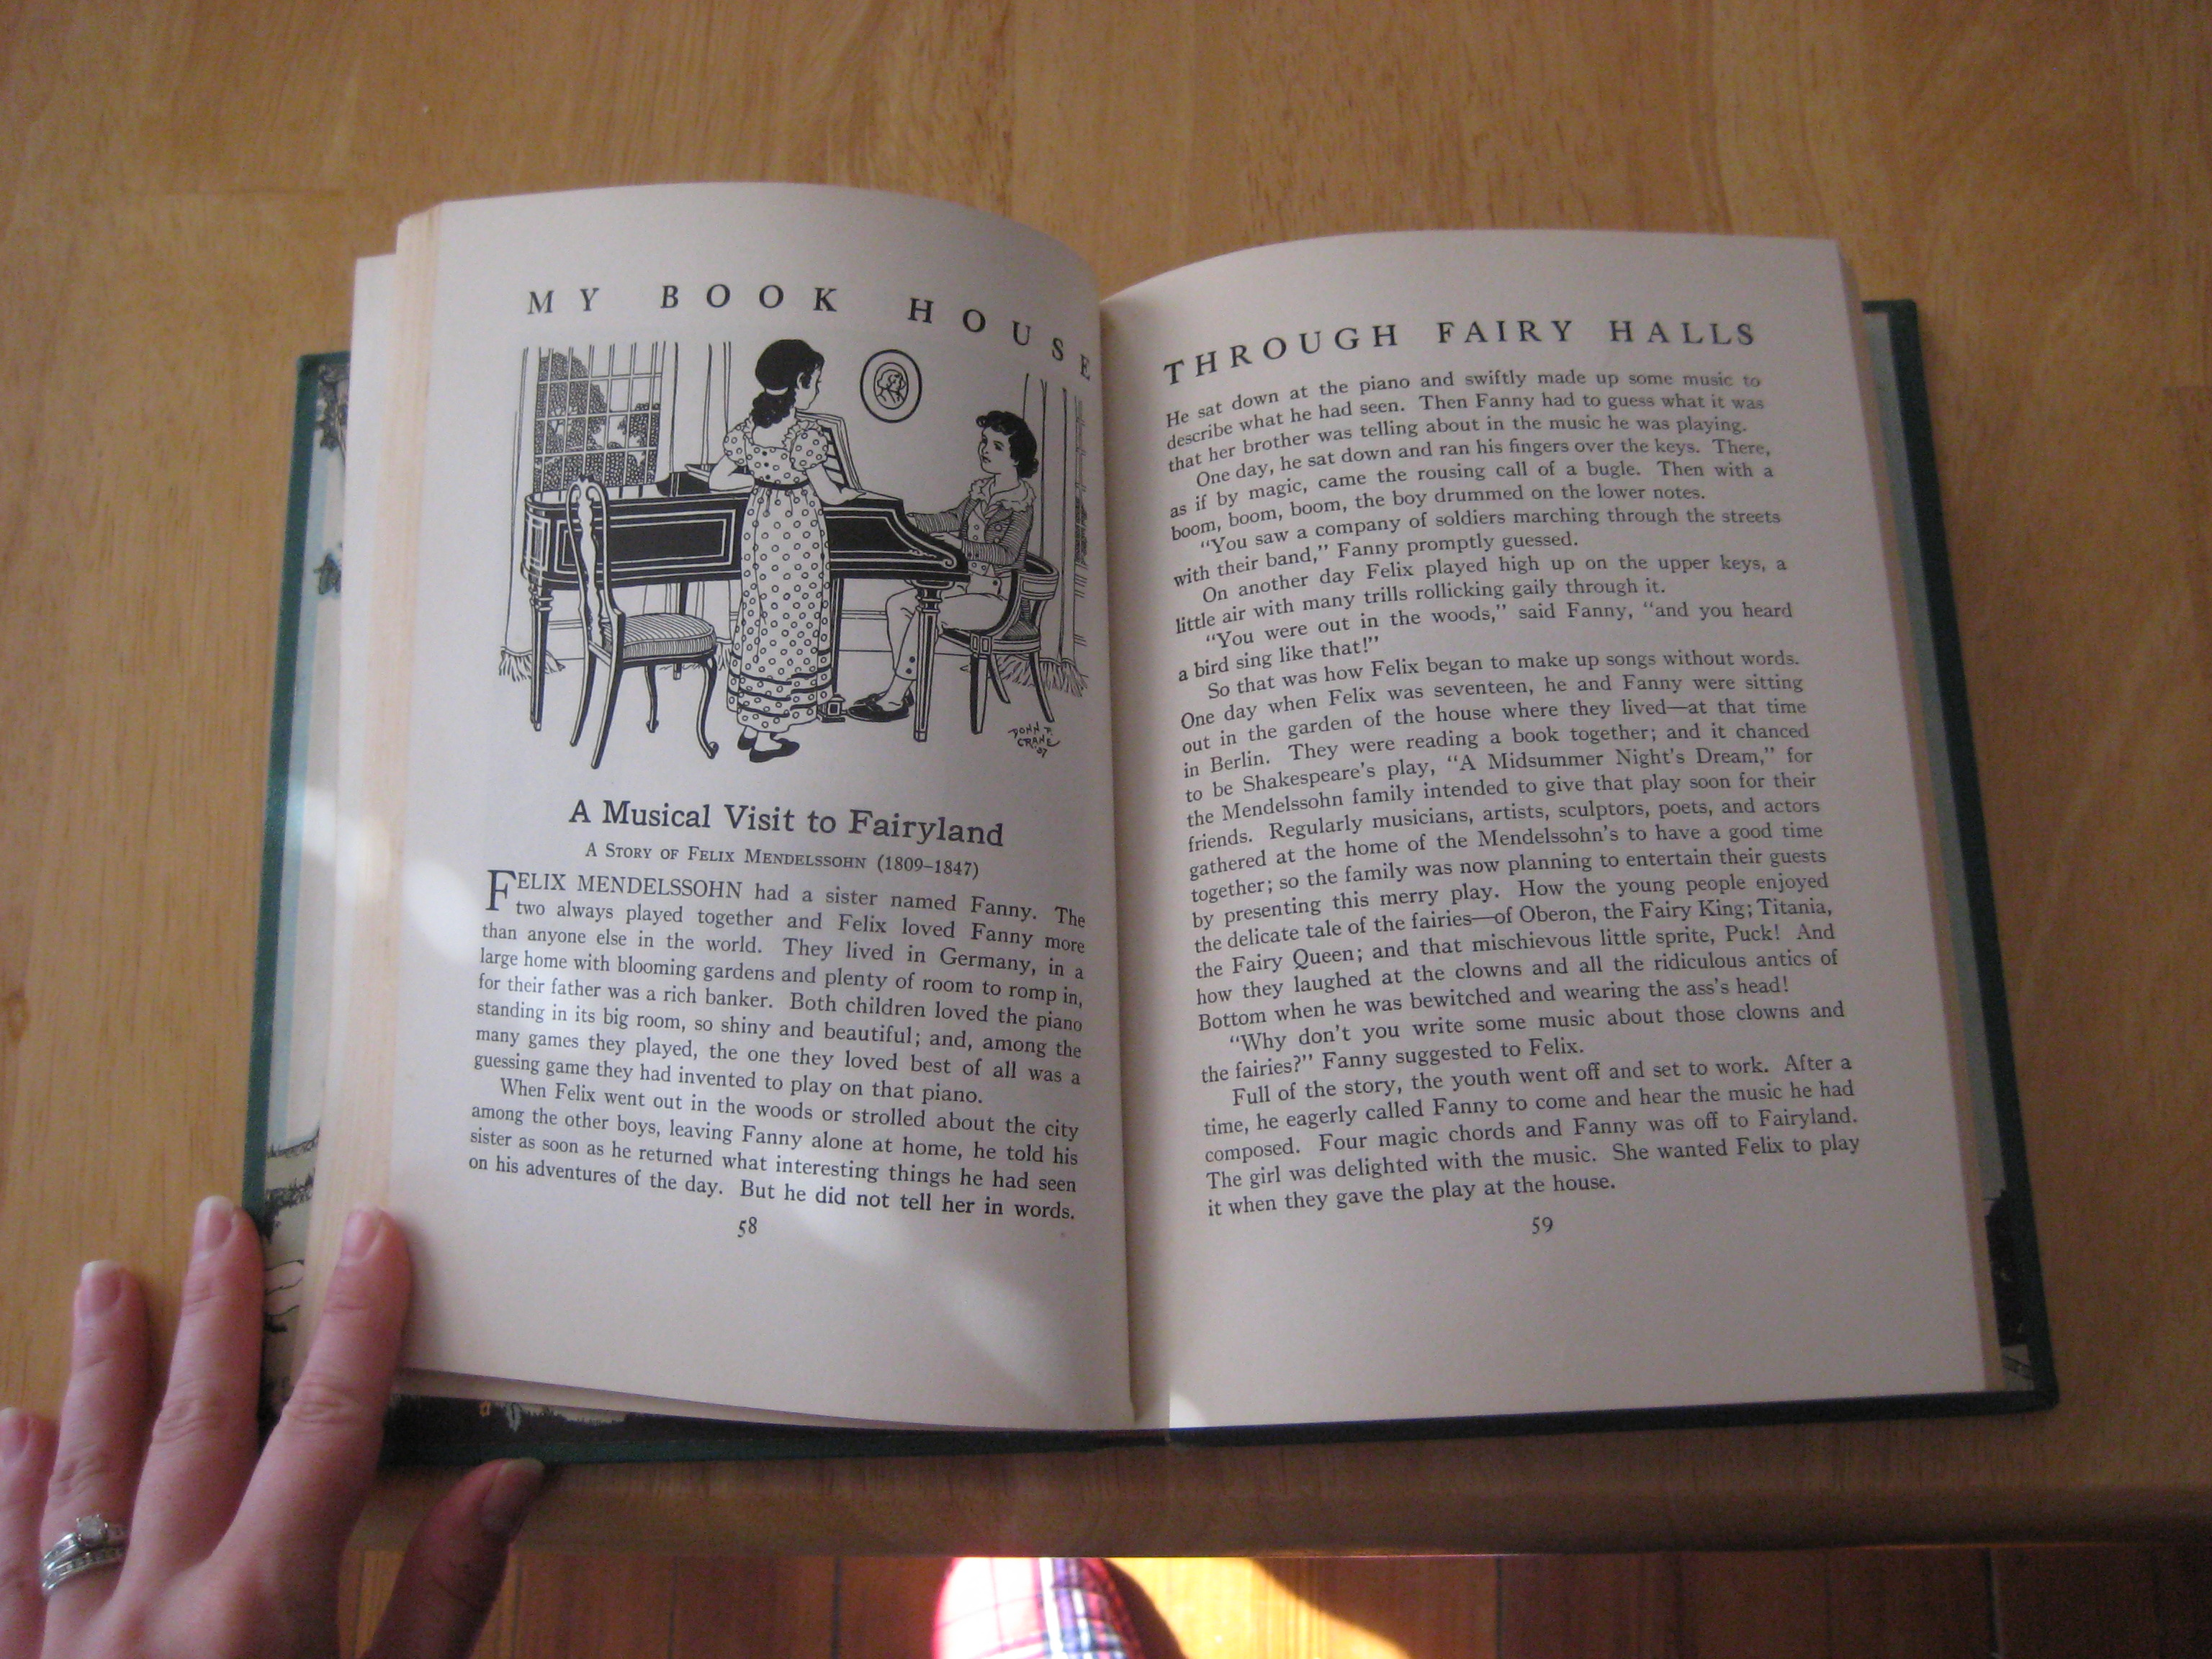 felix mendelssohn music midsummer night's dream my book house